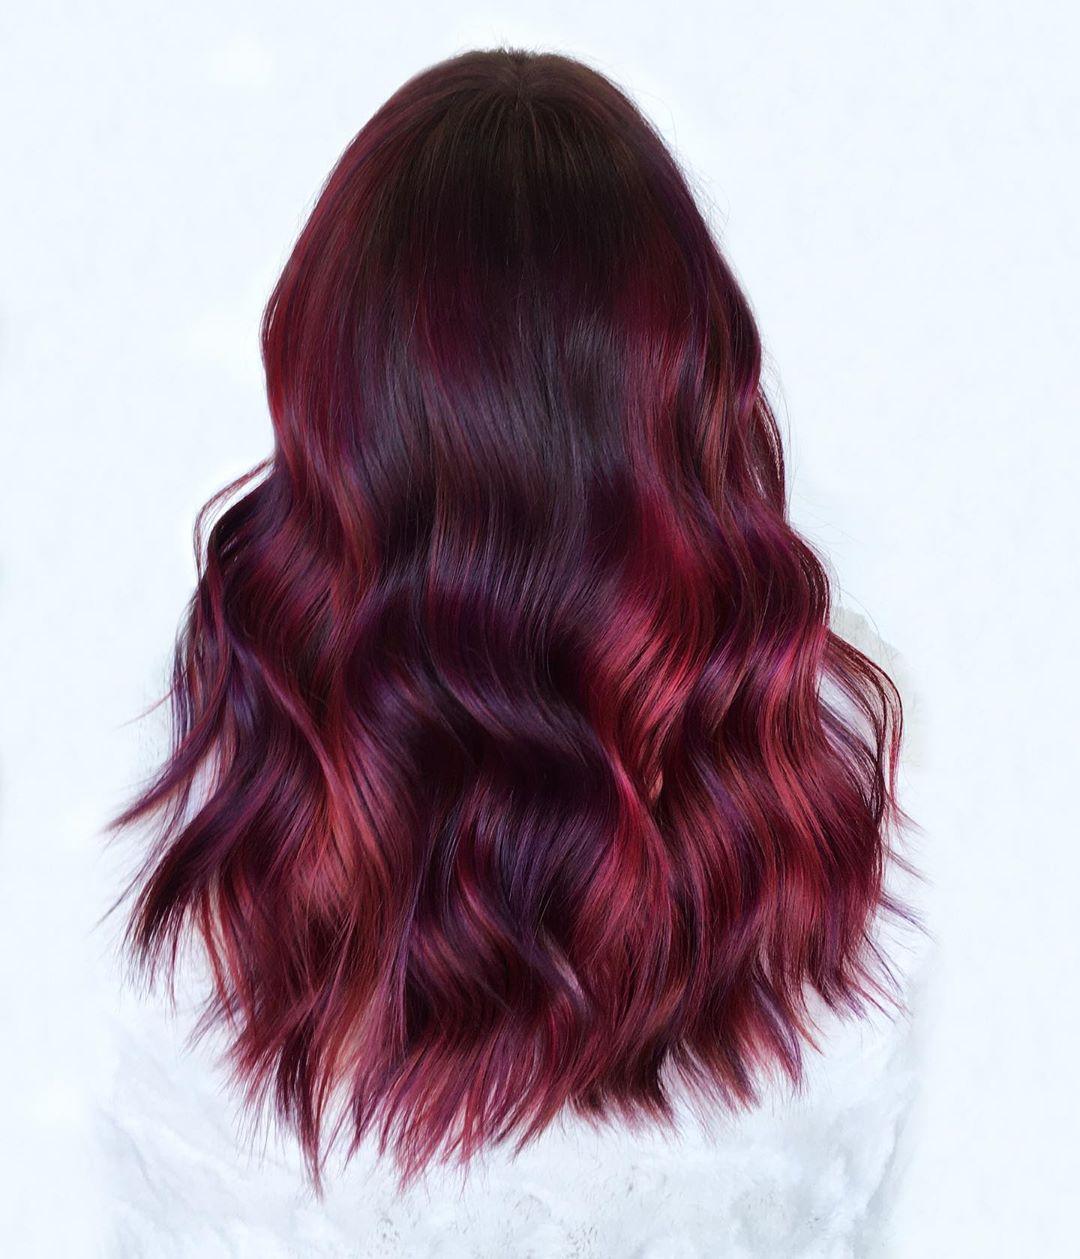 Glossy Burgundy Hair with Chunky Highlights